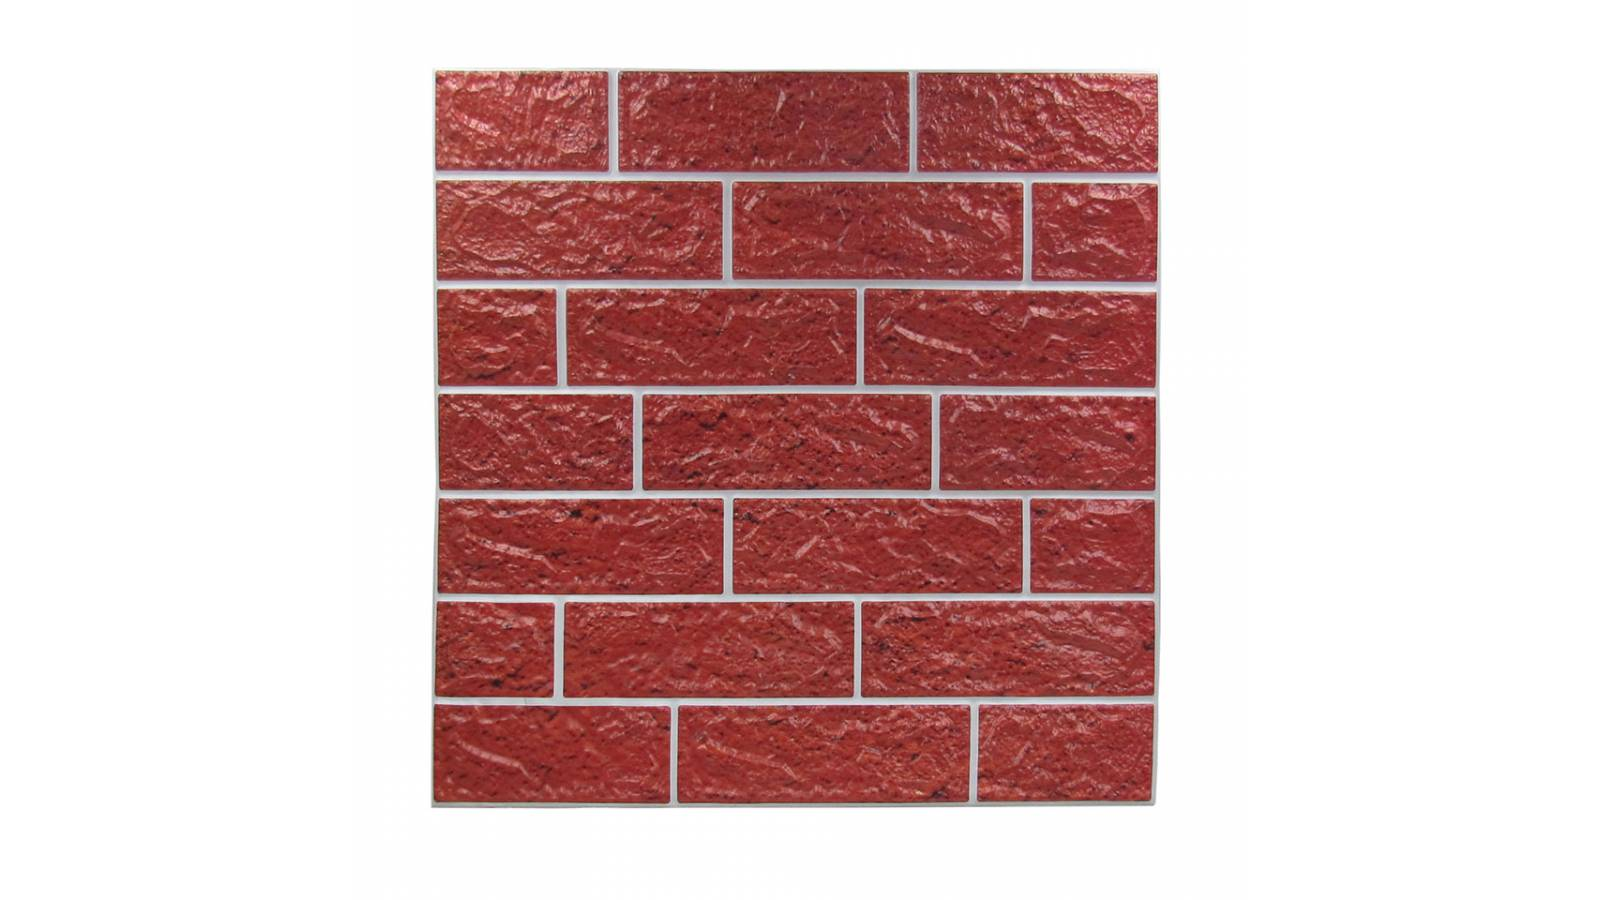 Revestimiento autodhesivo 3d Ladrillo Rojo - Pared wallpaper papel tapiz